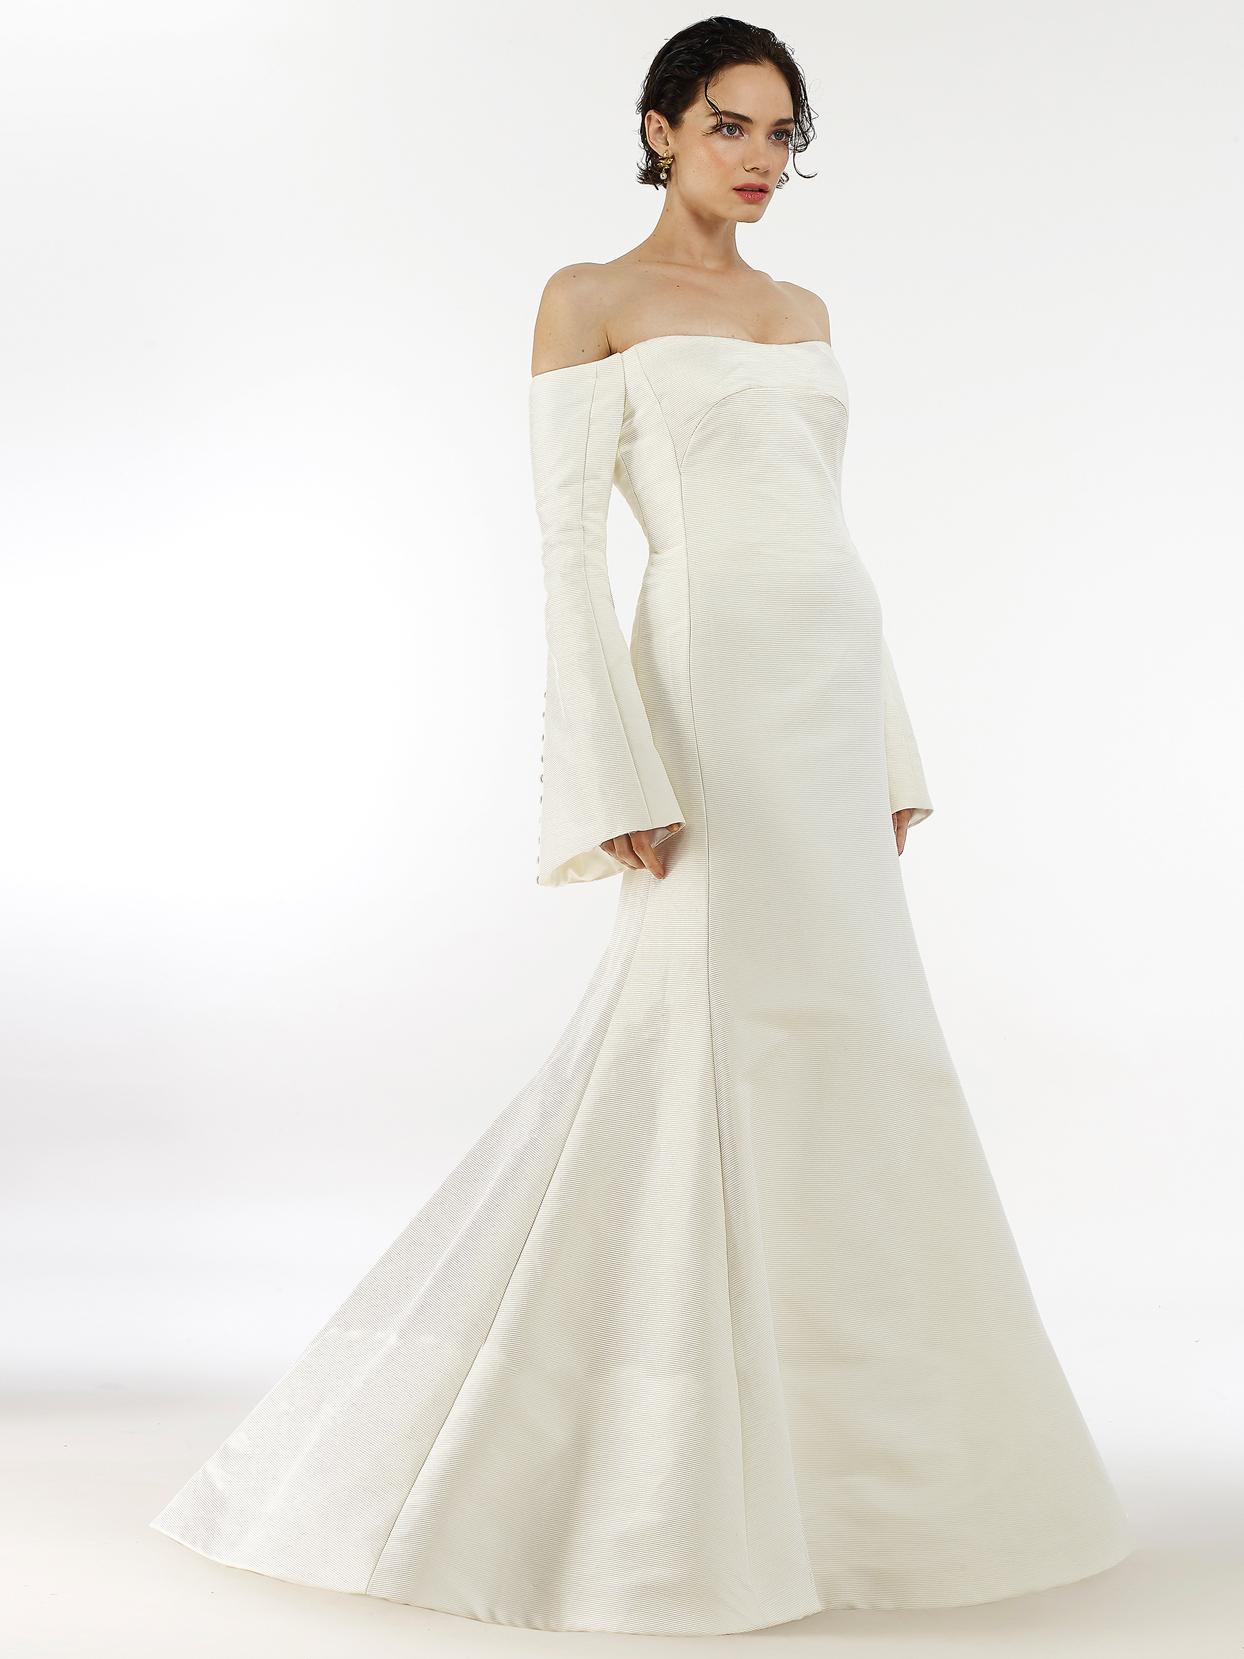 Steven Birnbaum straight across off-the-shoulder long bell sleeve mermaid wedding dress fall 2020